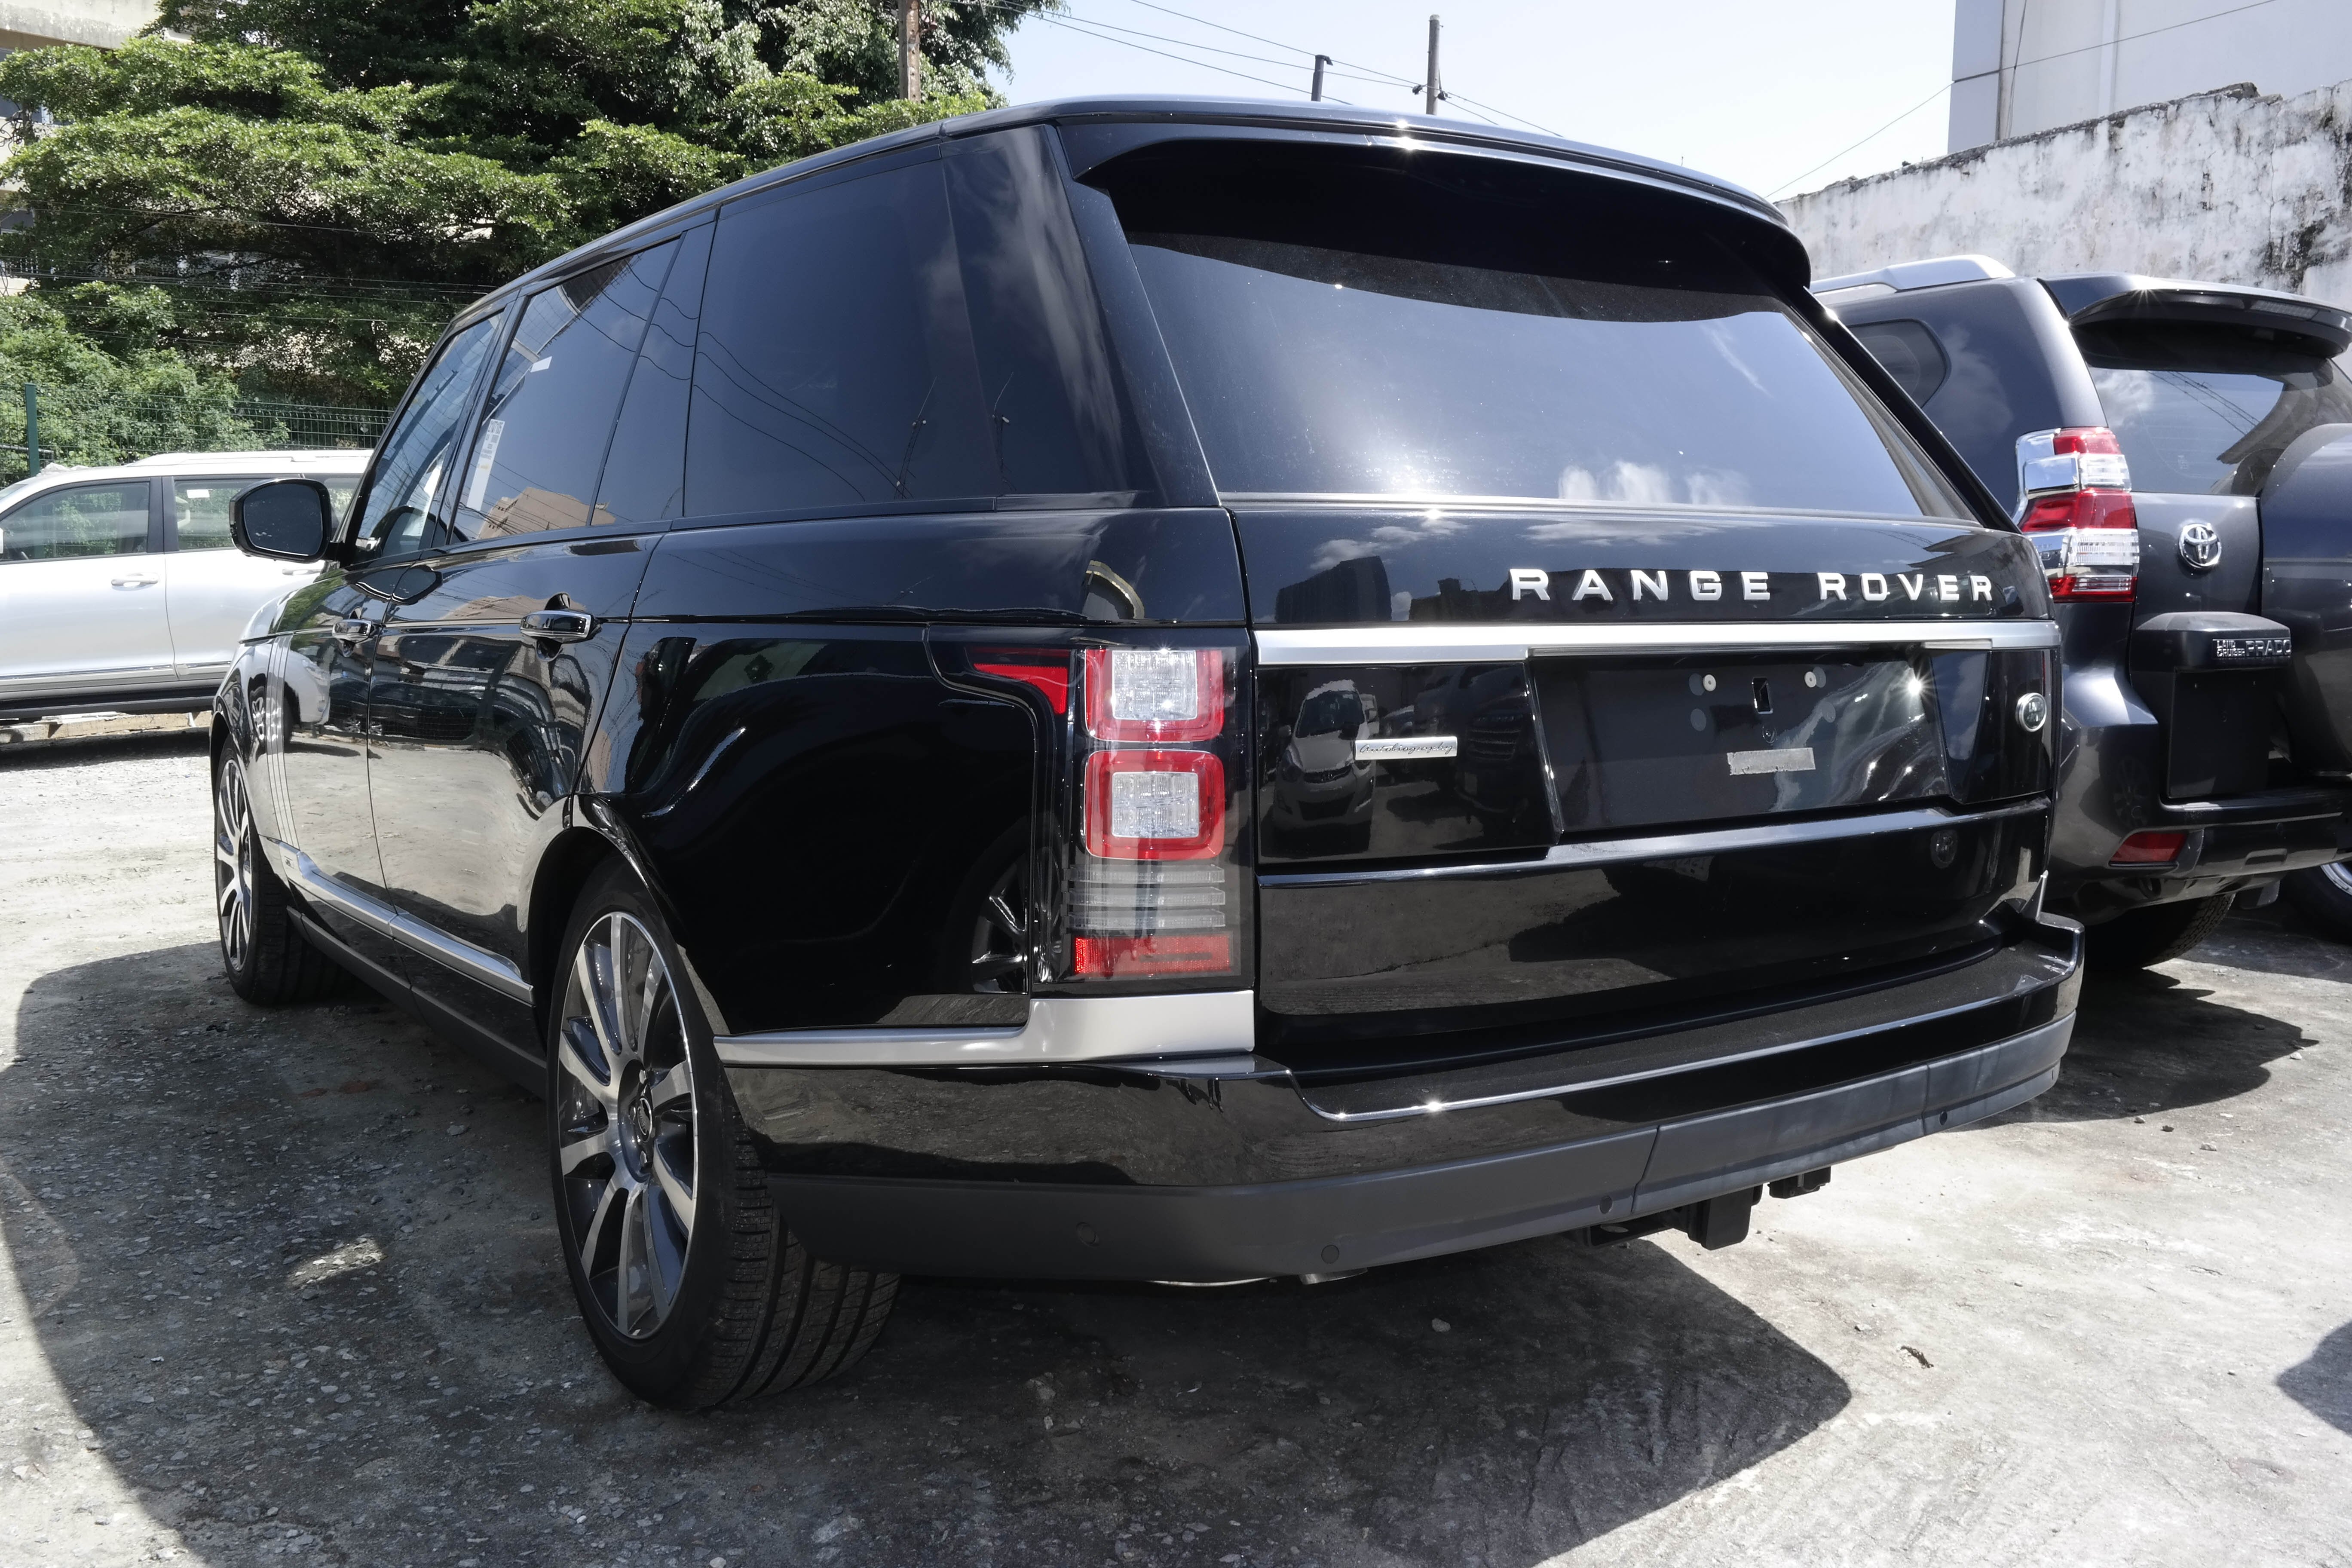 RANGE ROVER New & Used Cars for Sale Nigeria Zham Auto